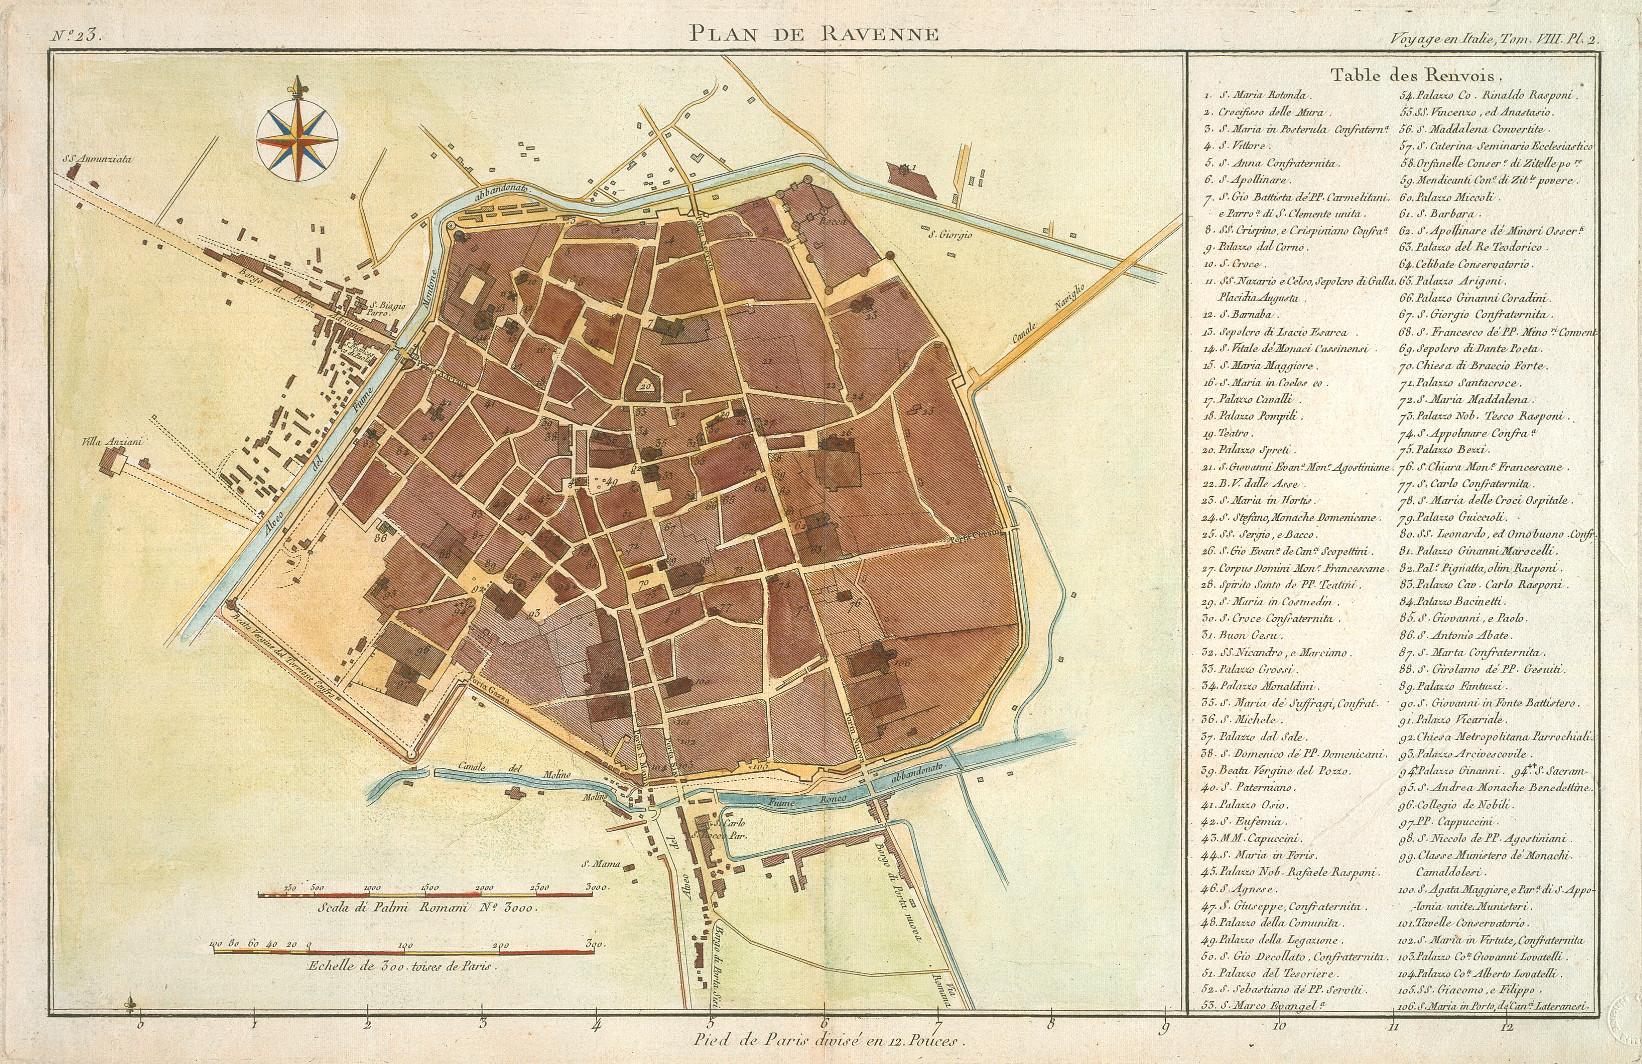 Plan de Ravenne autore: ignoto data: 1790 dimensioni: cm 22x36 contenuta in: J-J de La Lande, Voyage en Italie, VII, Desaint, Paris 1786